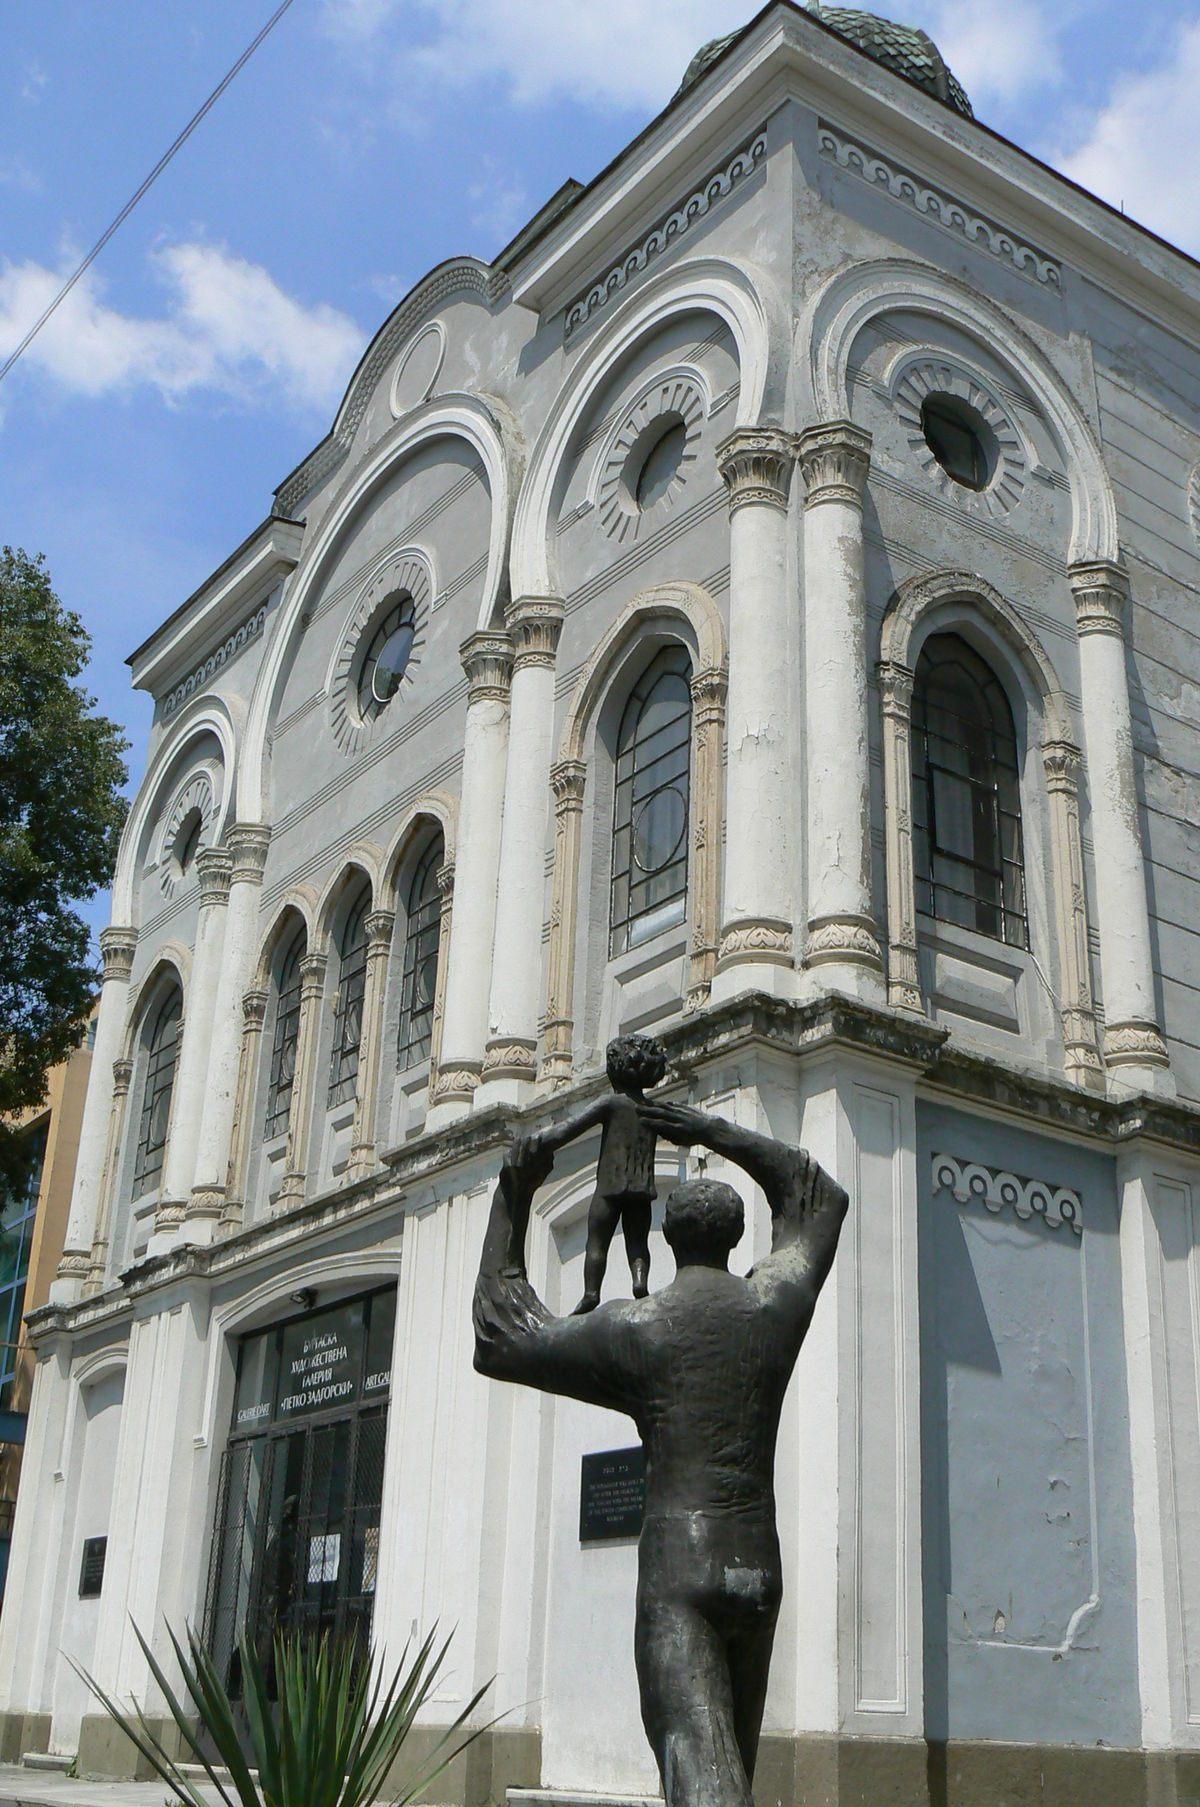 Lit De Camp 2 Places Joli History Of the Jews In Bulgaria